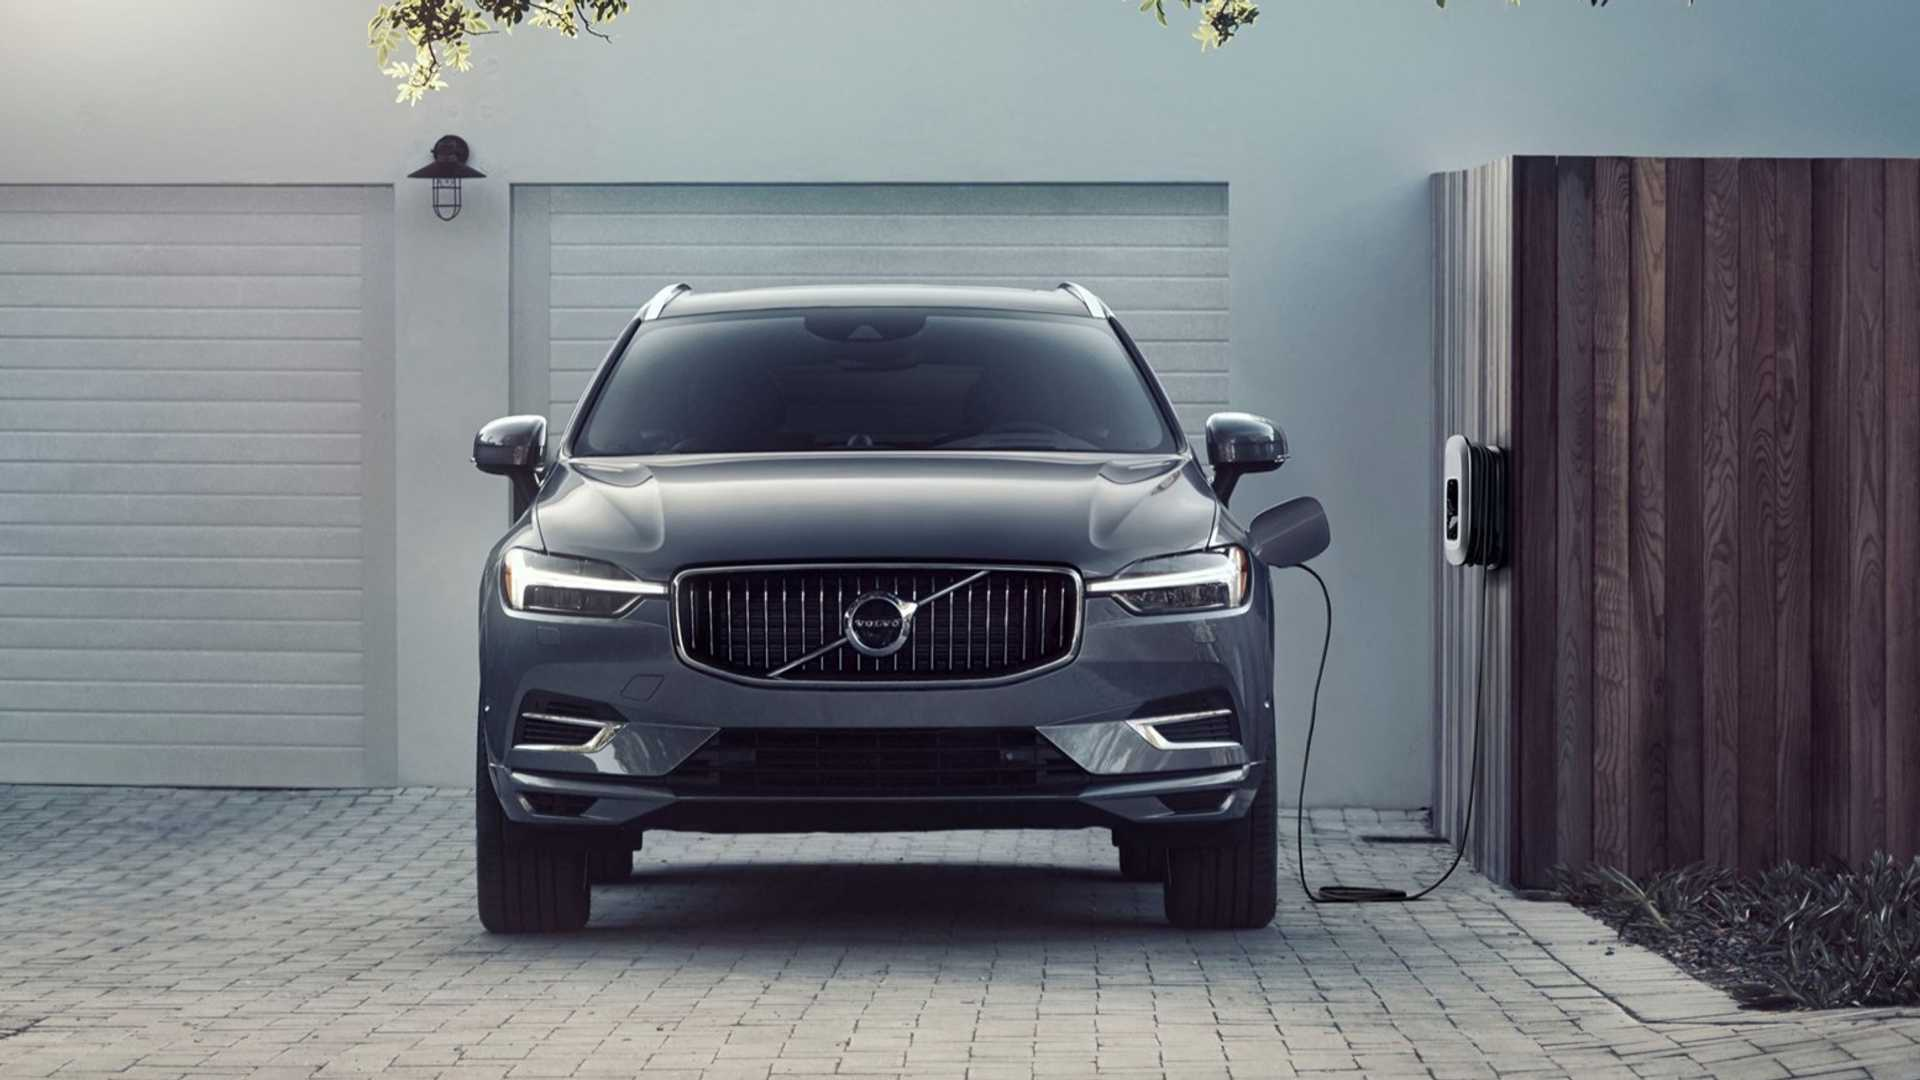 2020 Volvo XC60 Rumors